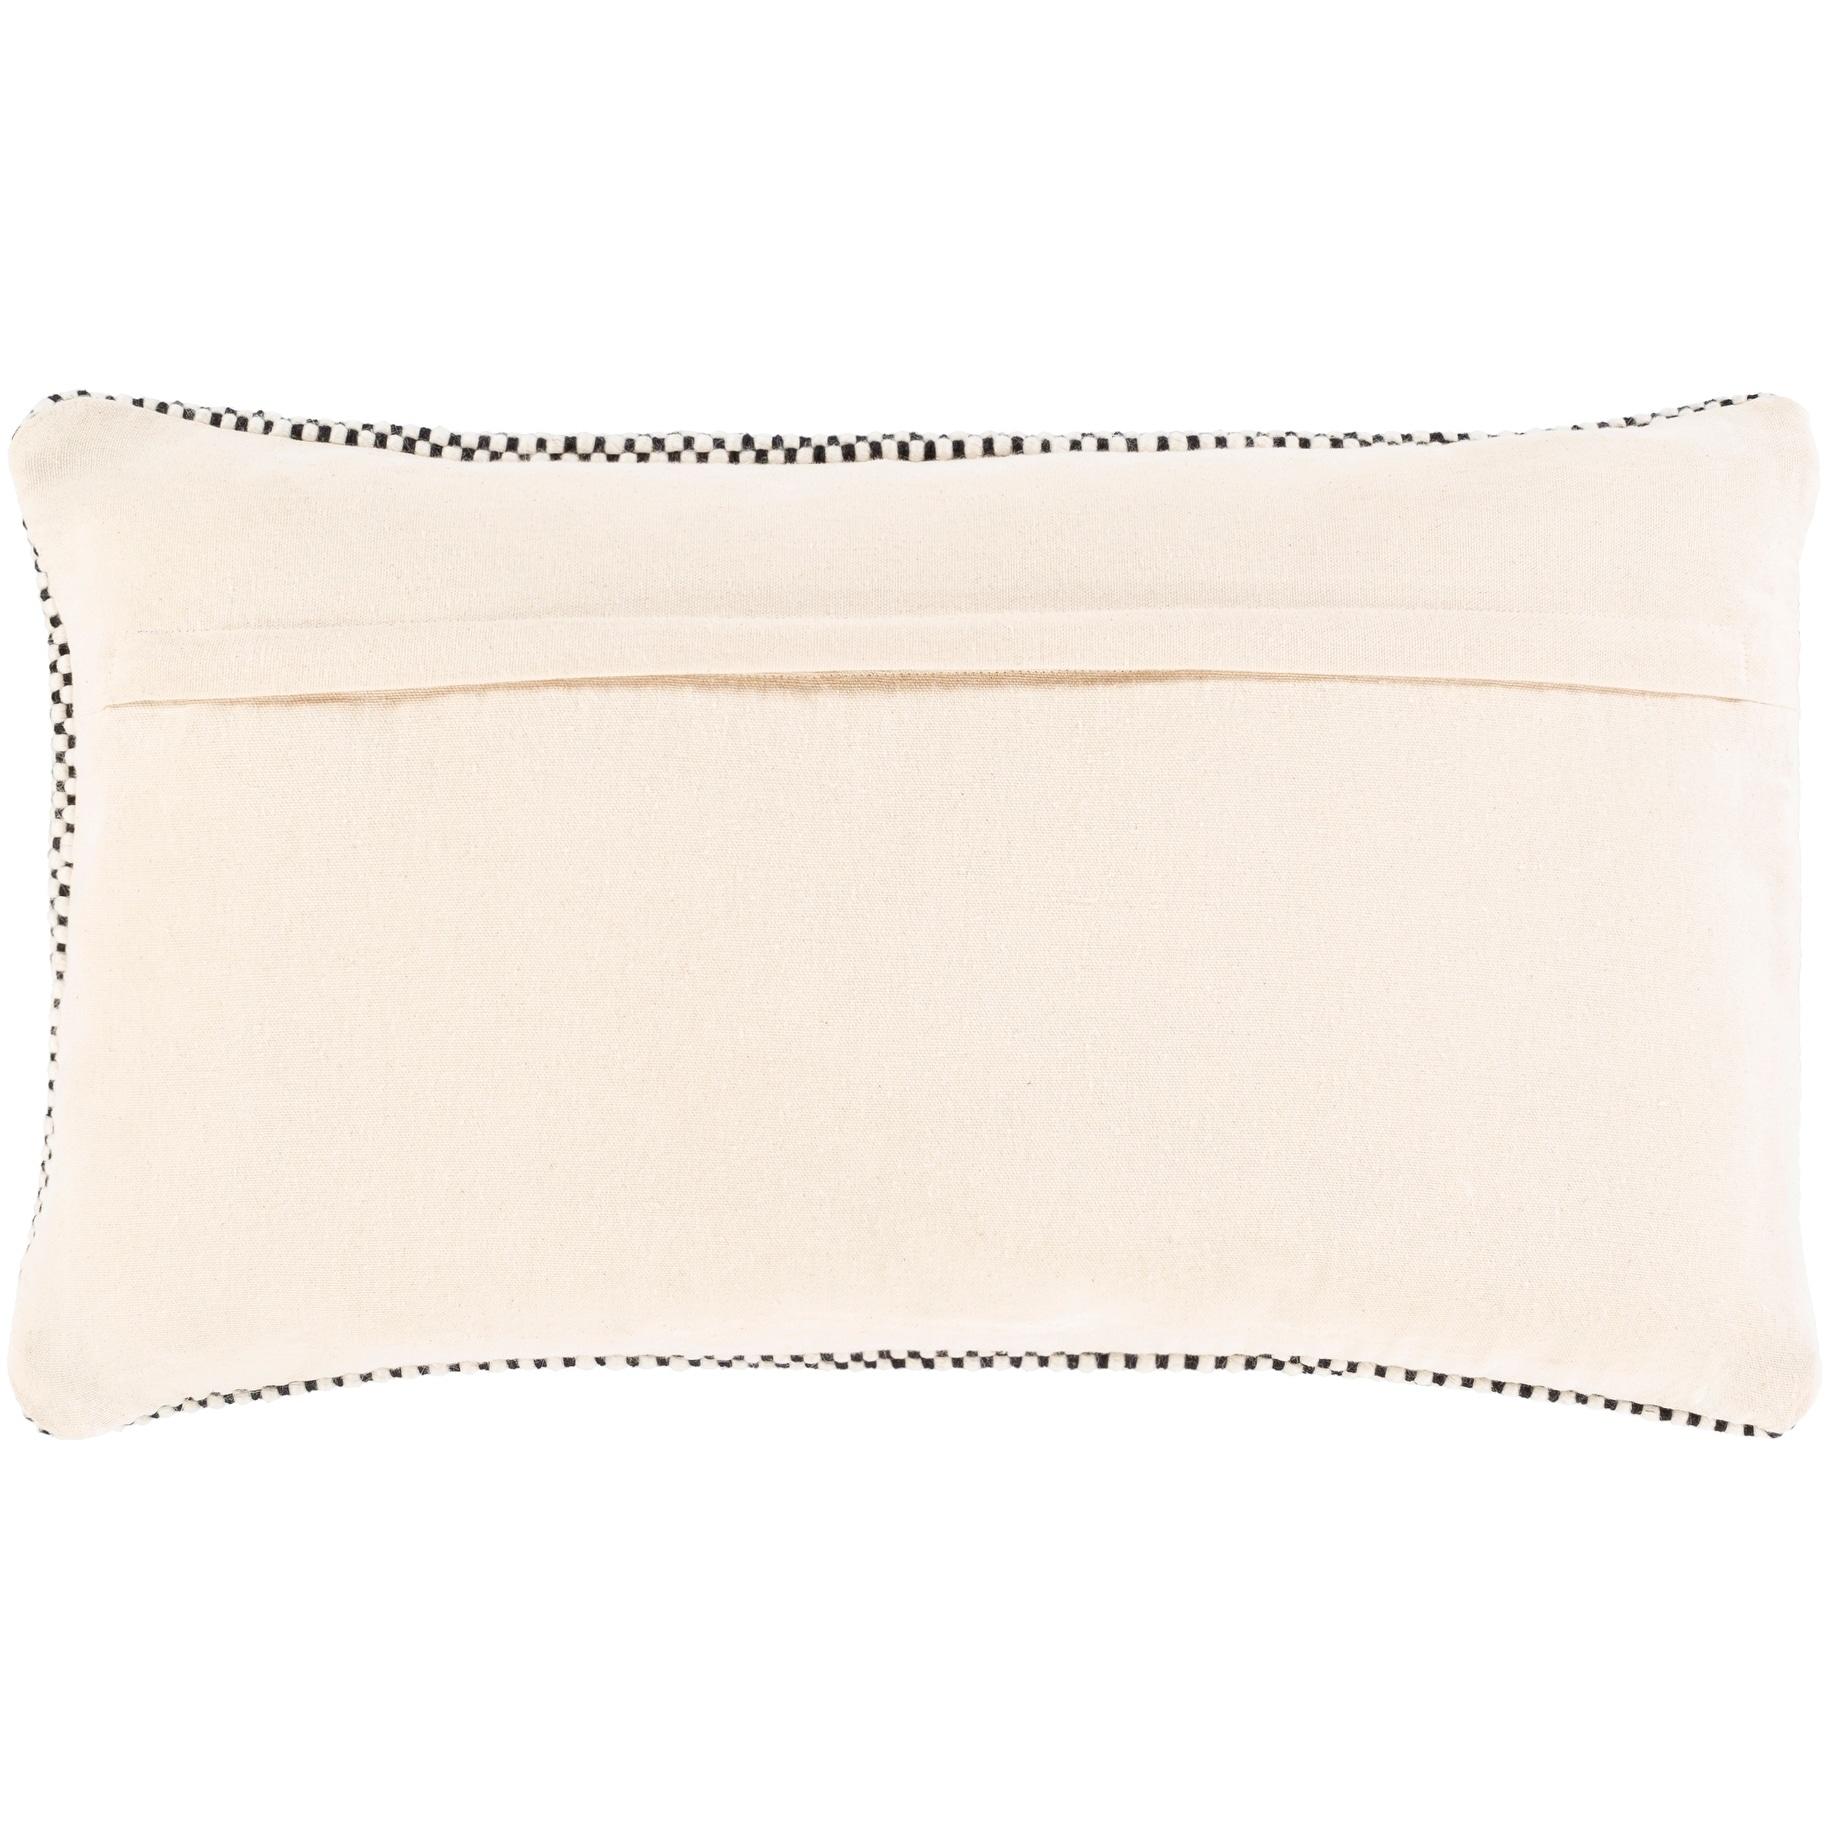 hadrea handwoven black white boho 14x24 inch lumbar throw pillow